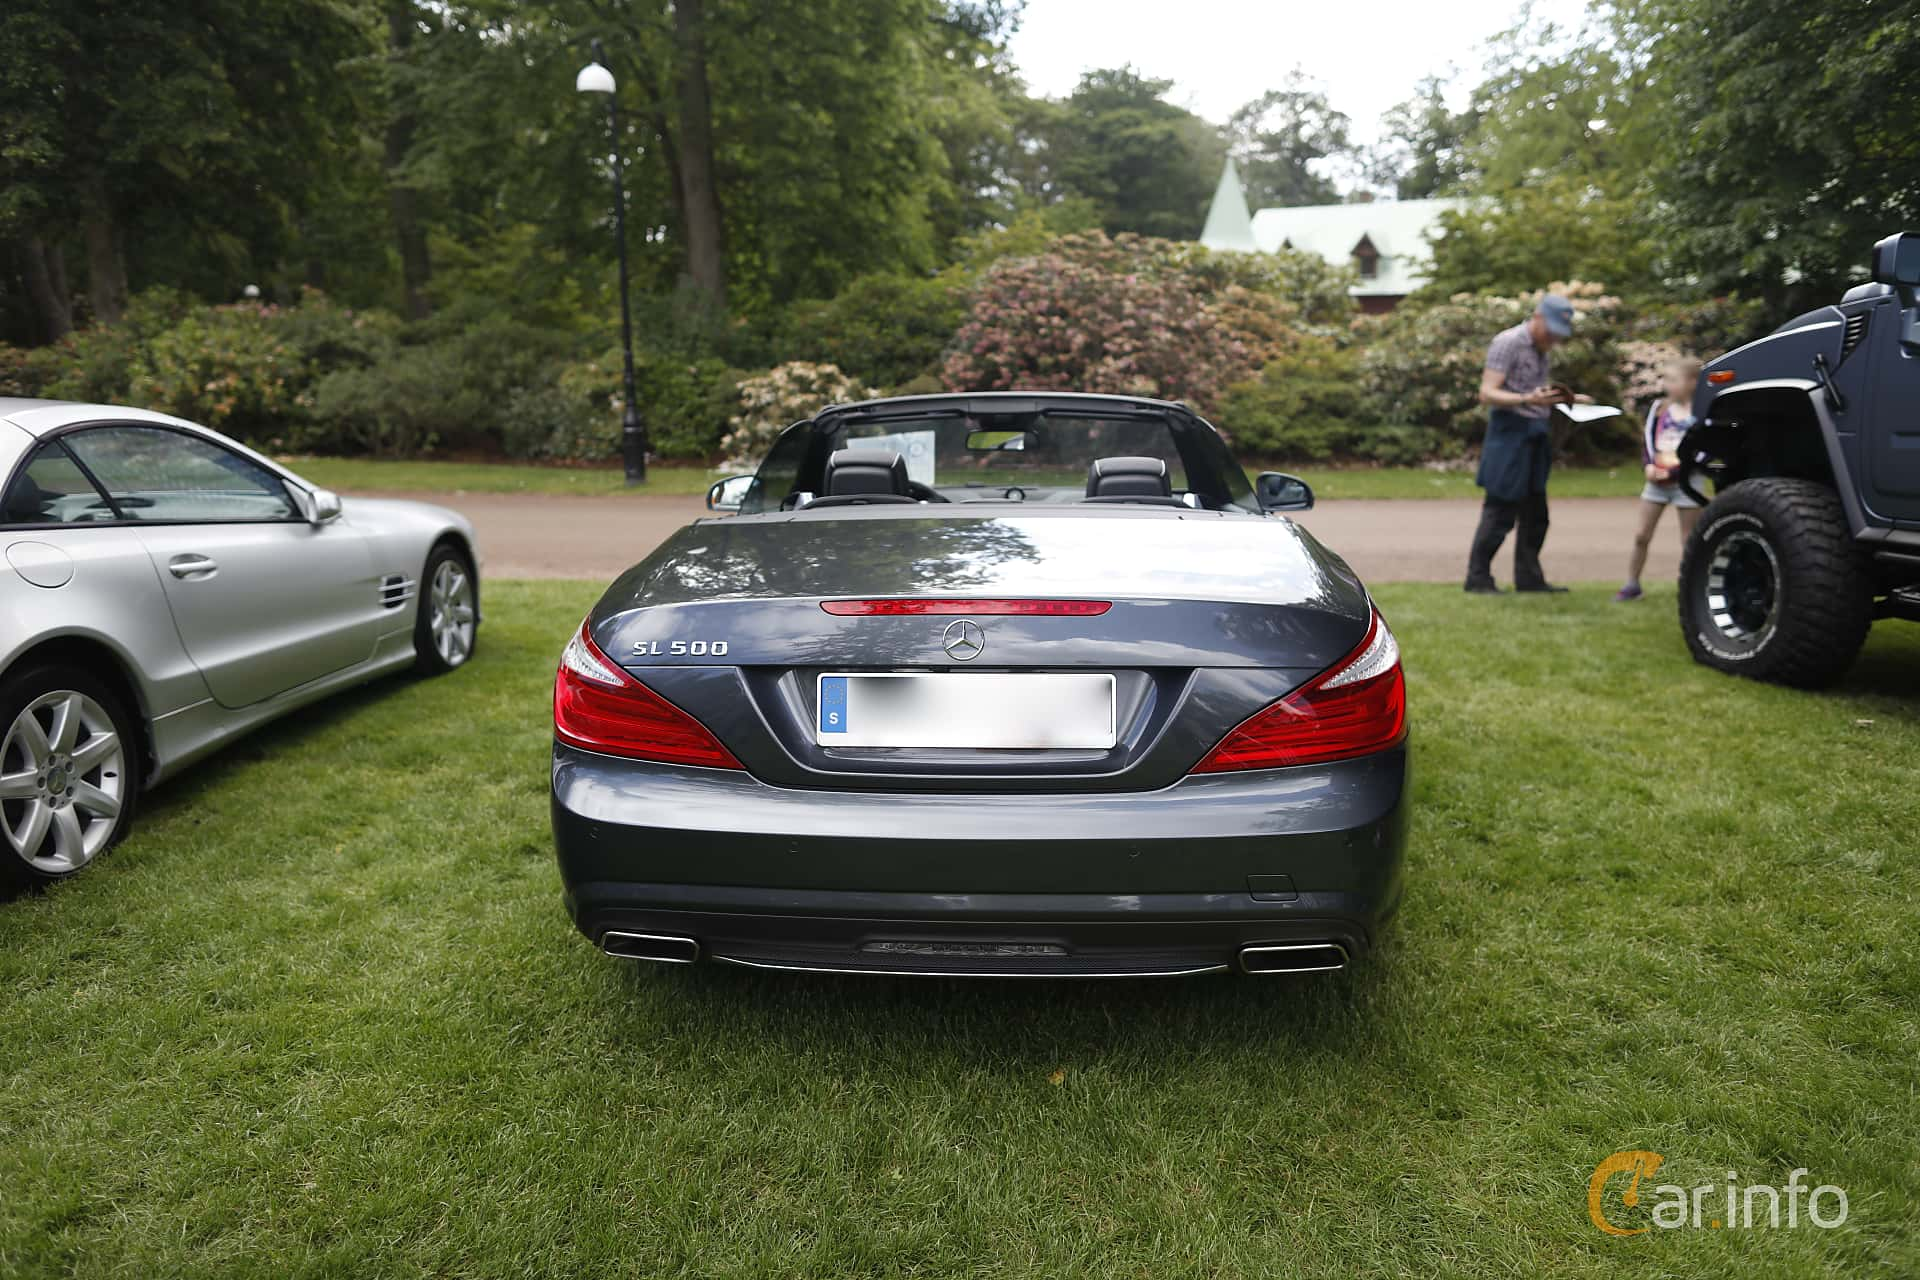 Mercedes-Benz SL 500  7G-Tronic Plus, 435hp, 2013 at Sofiero Classic 2019